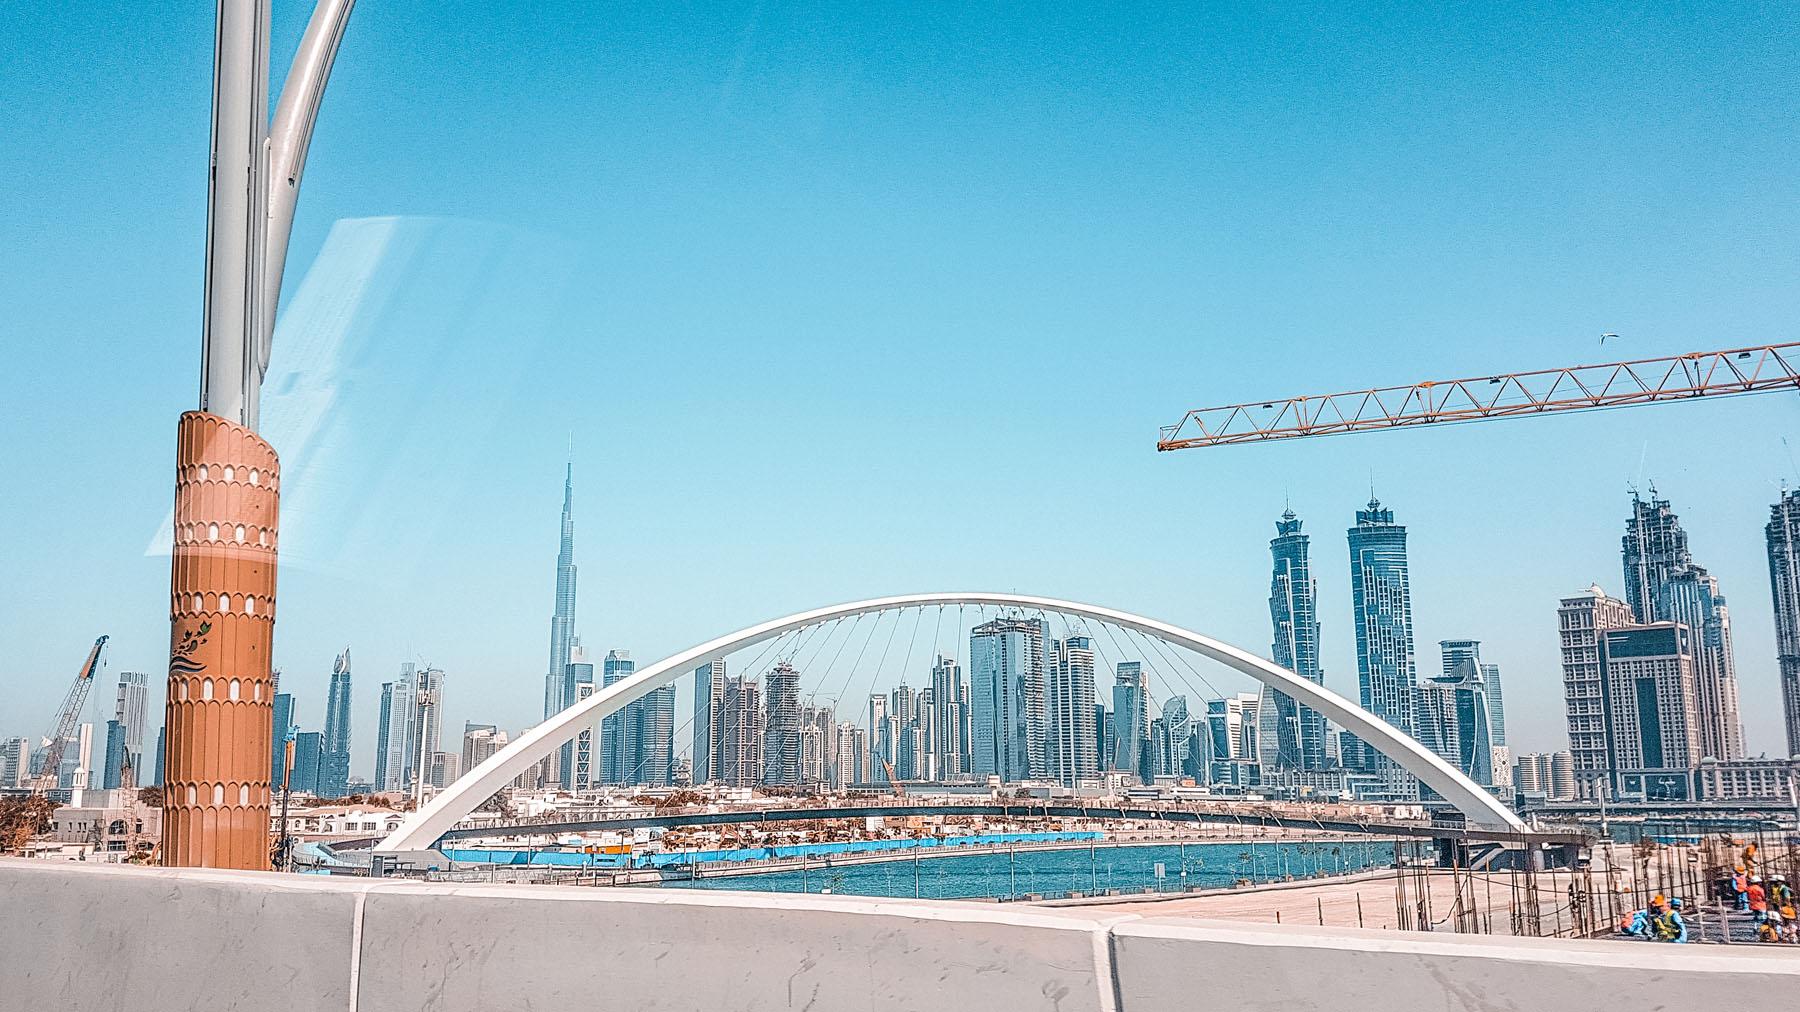 Orient Kreuzfahrt Taxi fahren in Dubai Ausblick